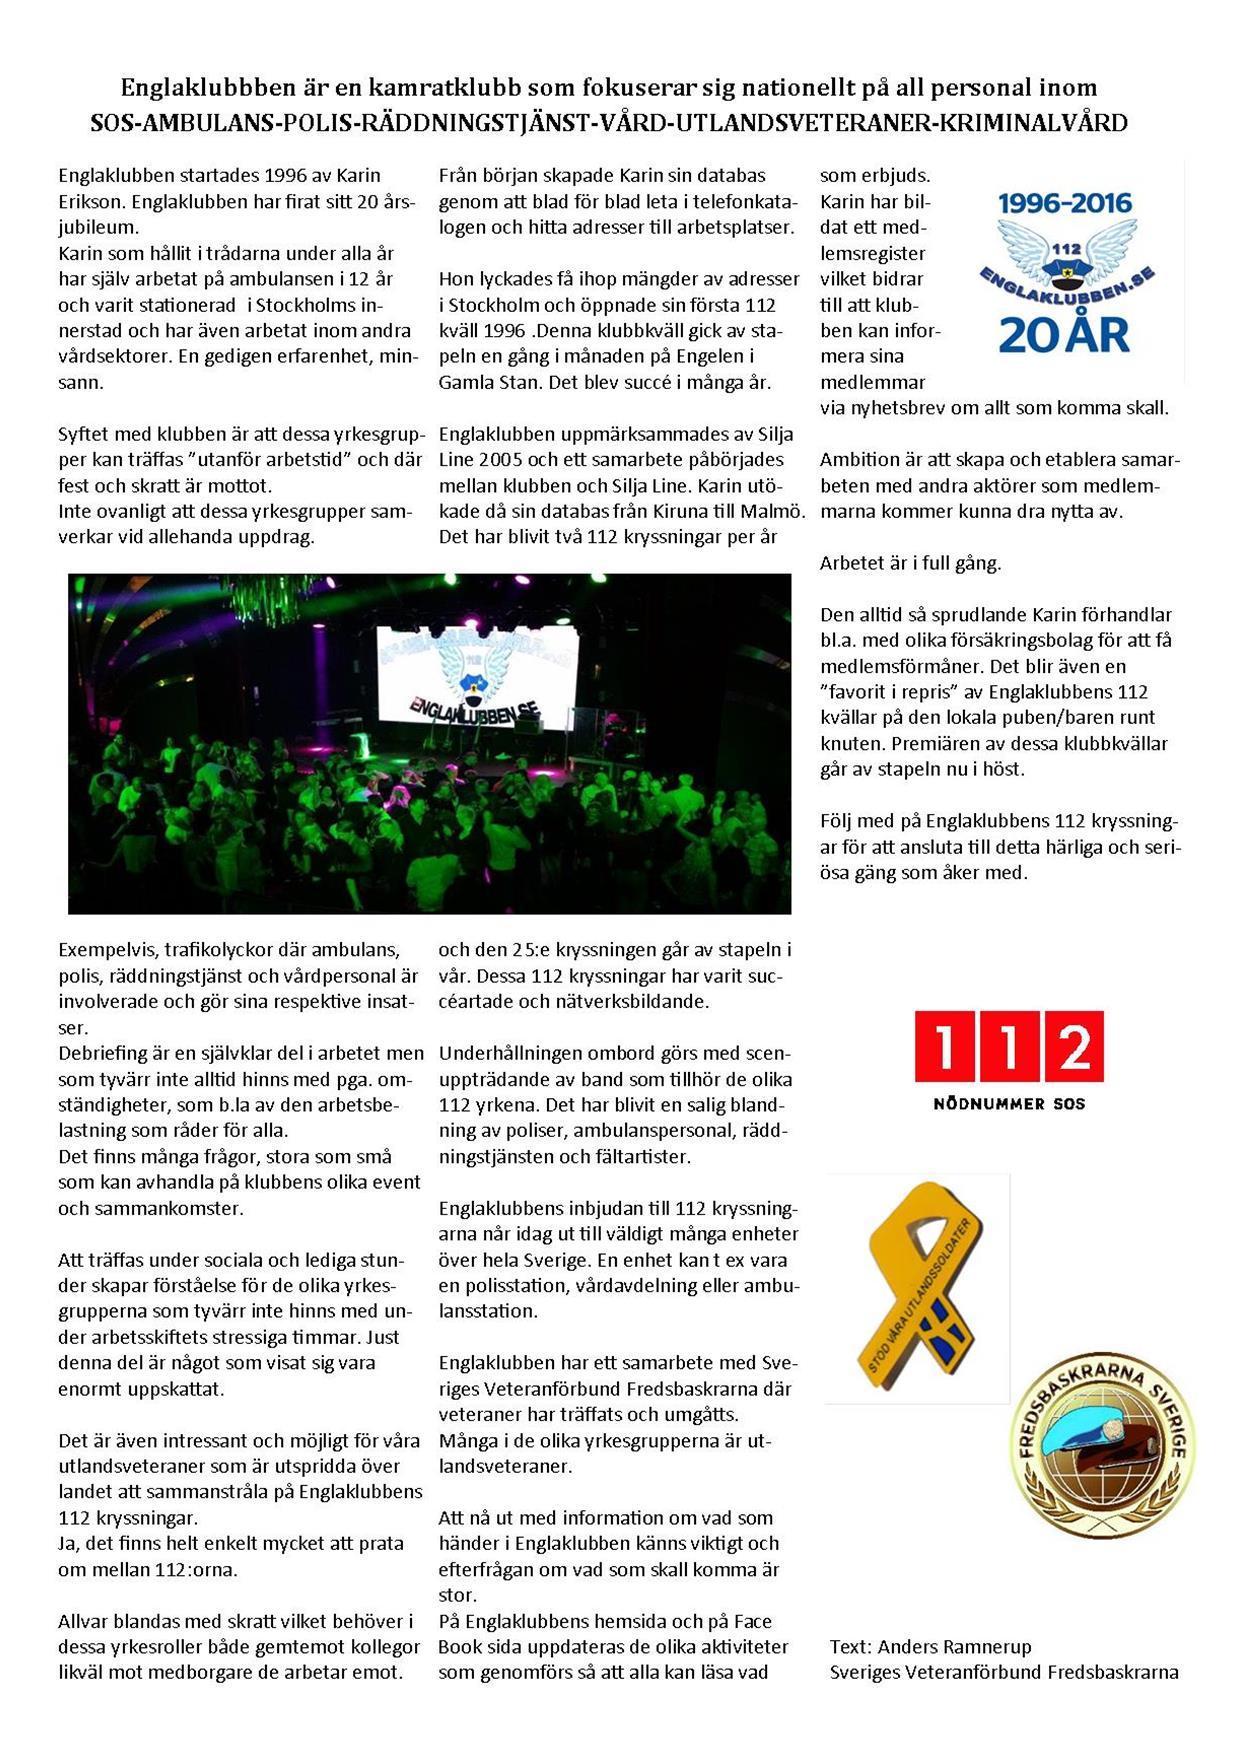 1 reportGET Publikation1